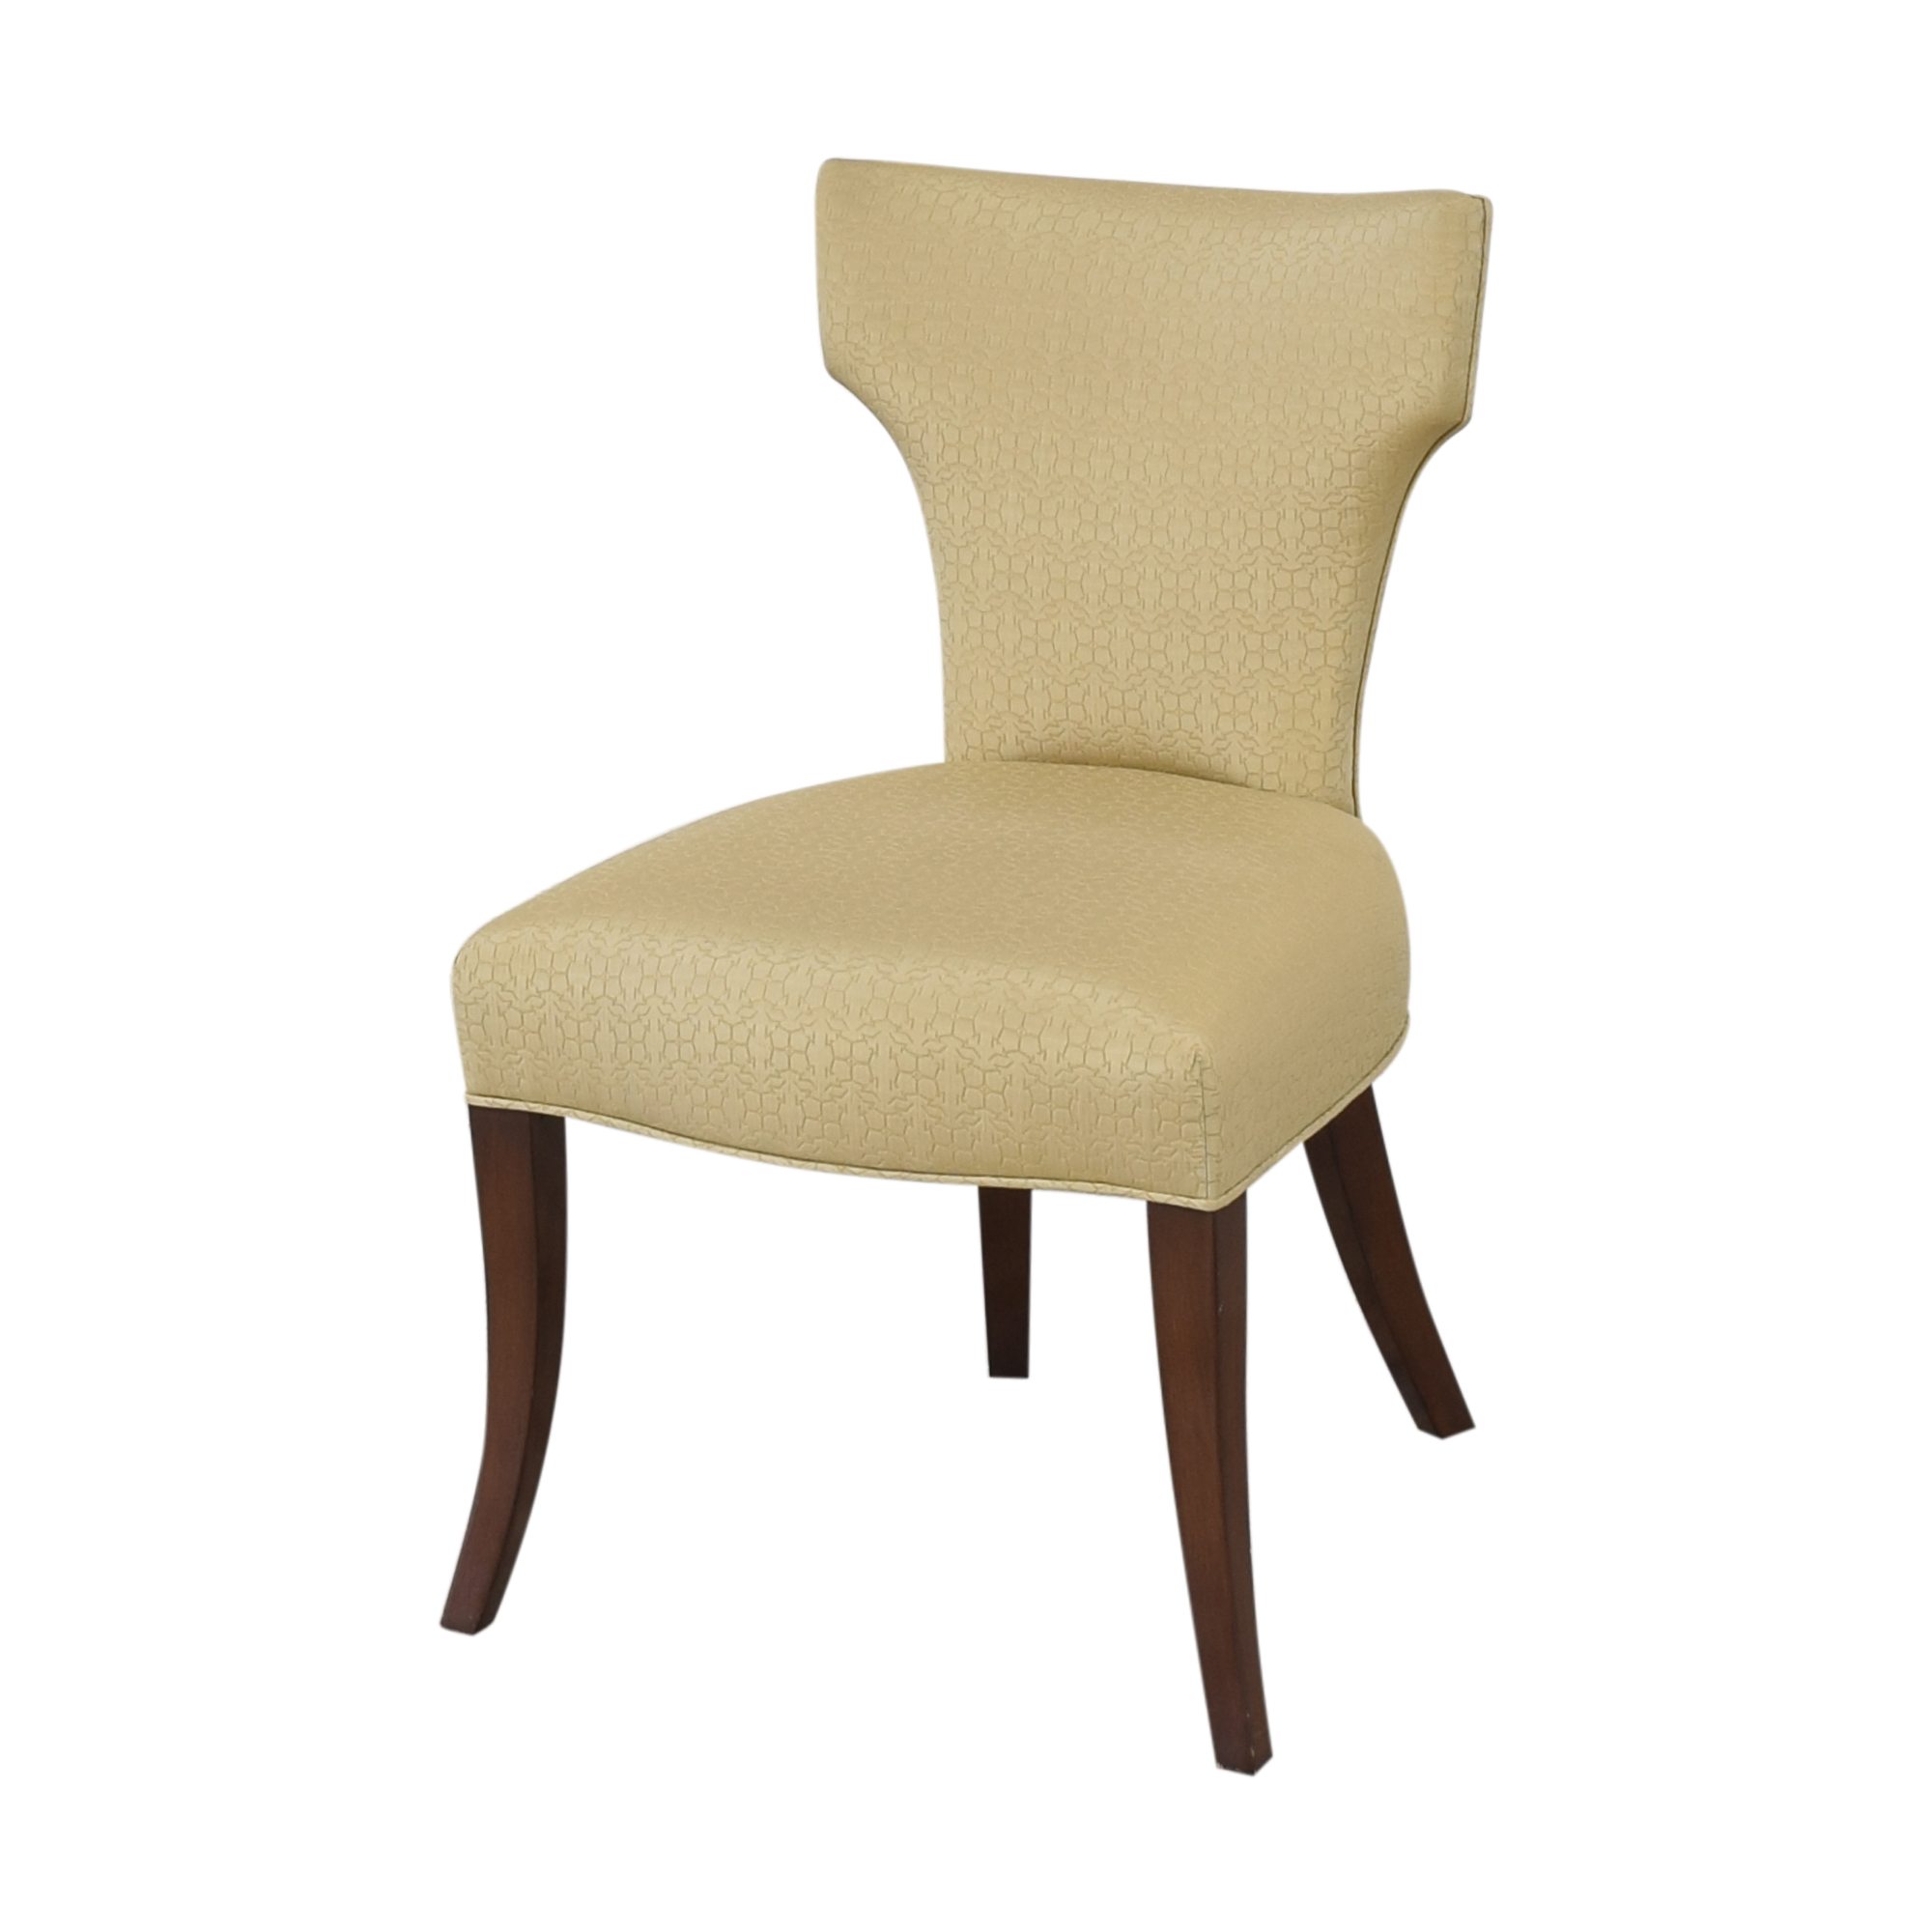 Ferrell Mittman Ferrell Mittman Custom Wing Dining Chairs pa